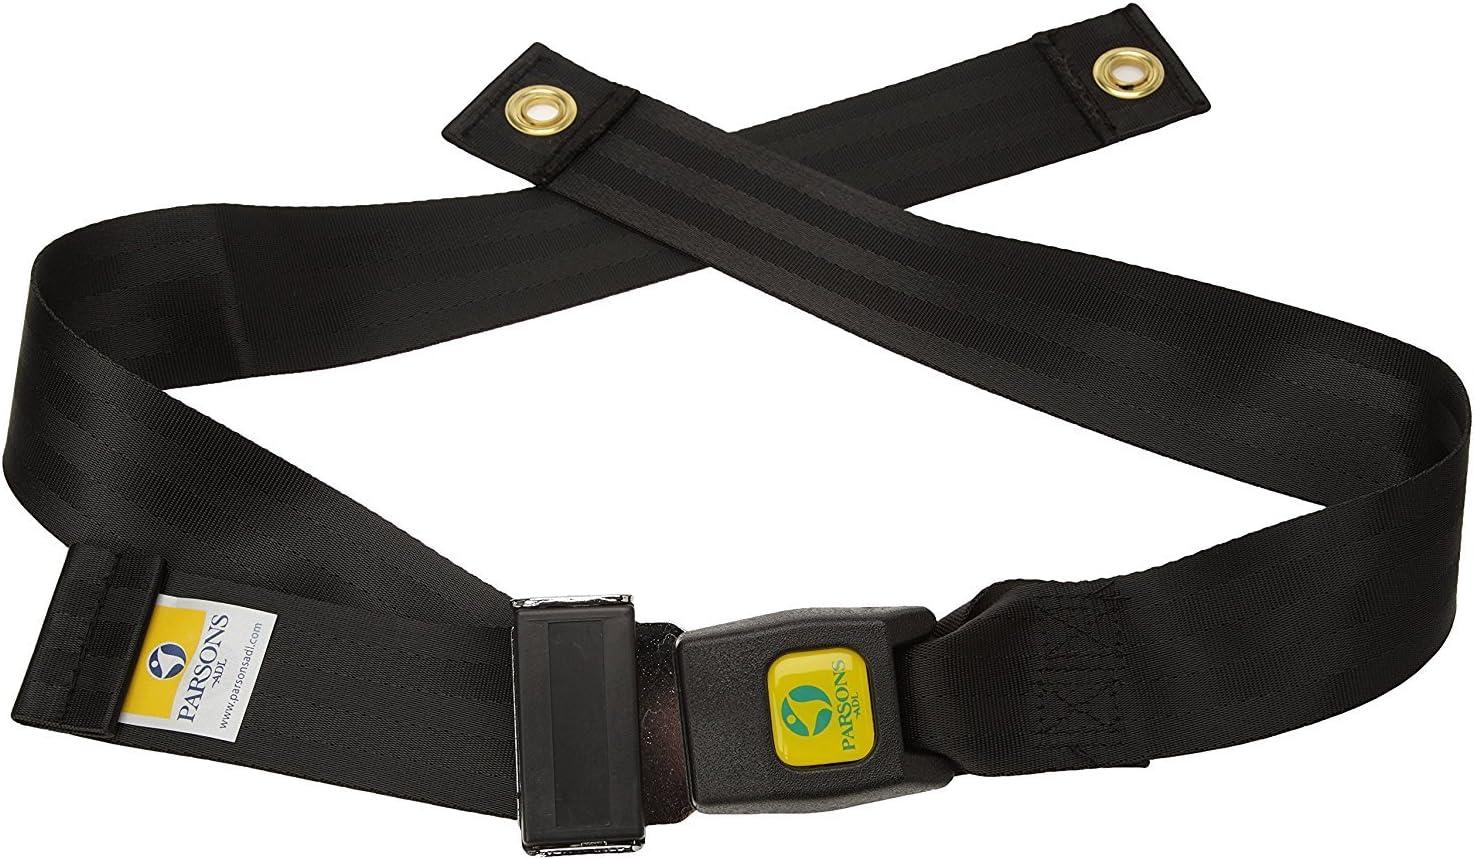 Patterson Medical - Cinturón para silla de ruedas con accesorio para tornillos